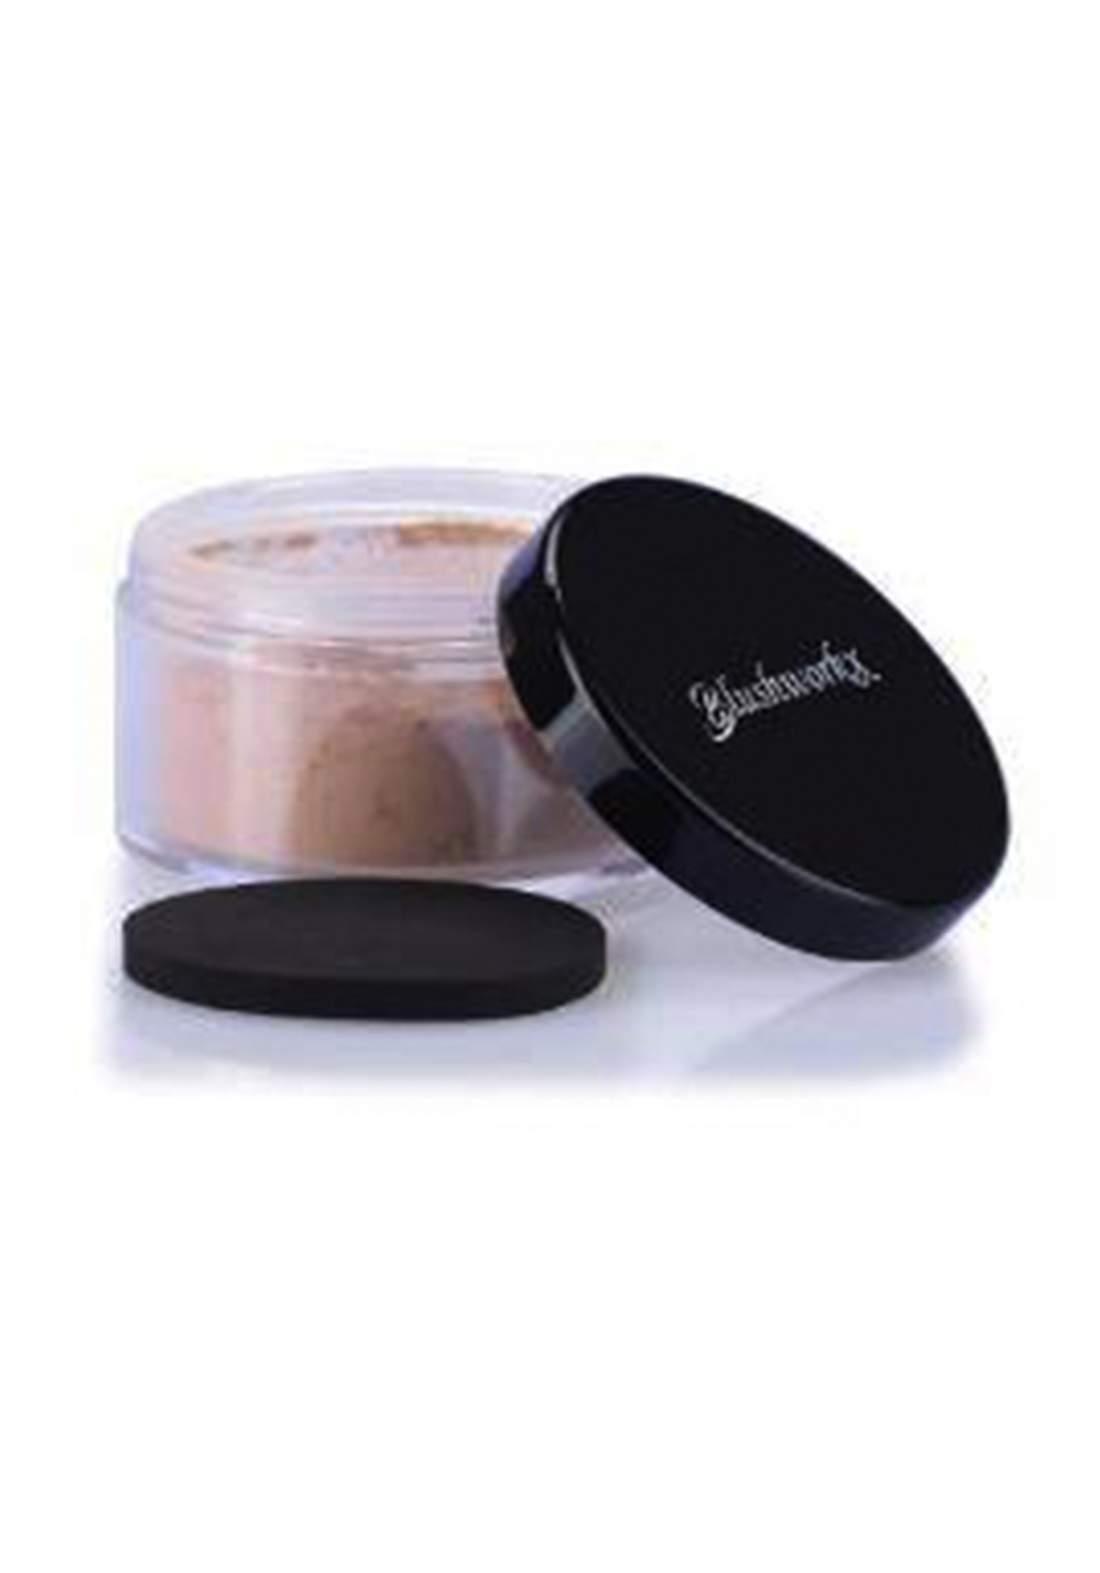 Blushworkx Hollywood Loose Mineral Powder  Foundation SPF 15 7g Medium لوس باودر مع واقي شمس